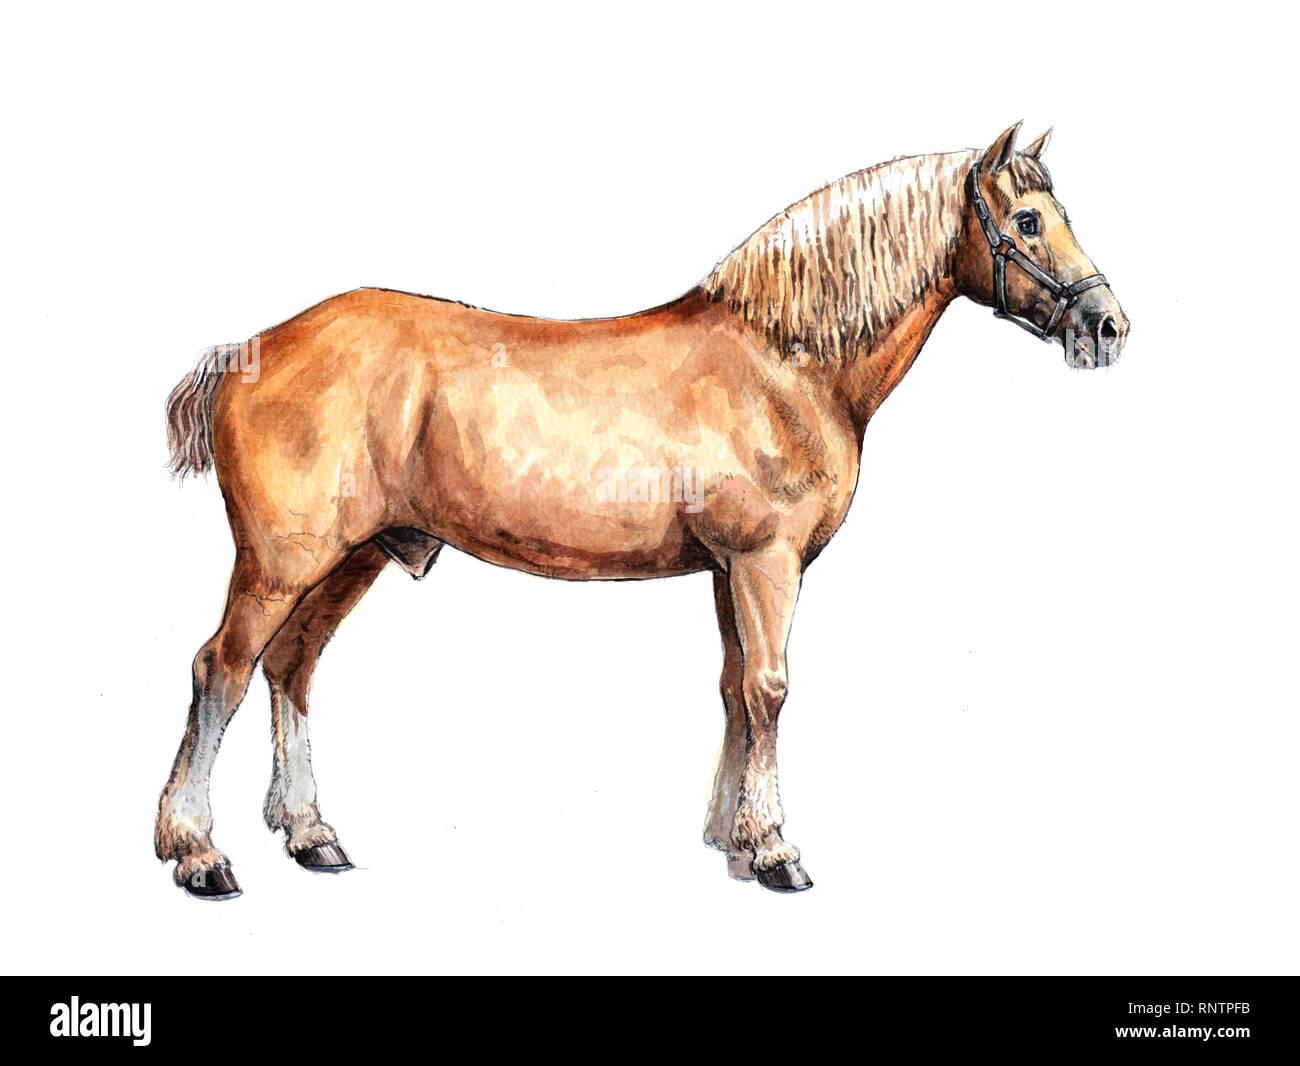 Draft Horse Illustration Horse Portrait Watercolor Painting Stock Photo Alamy